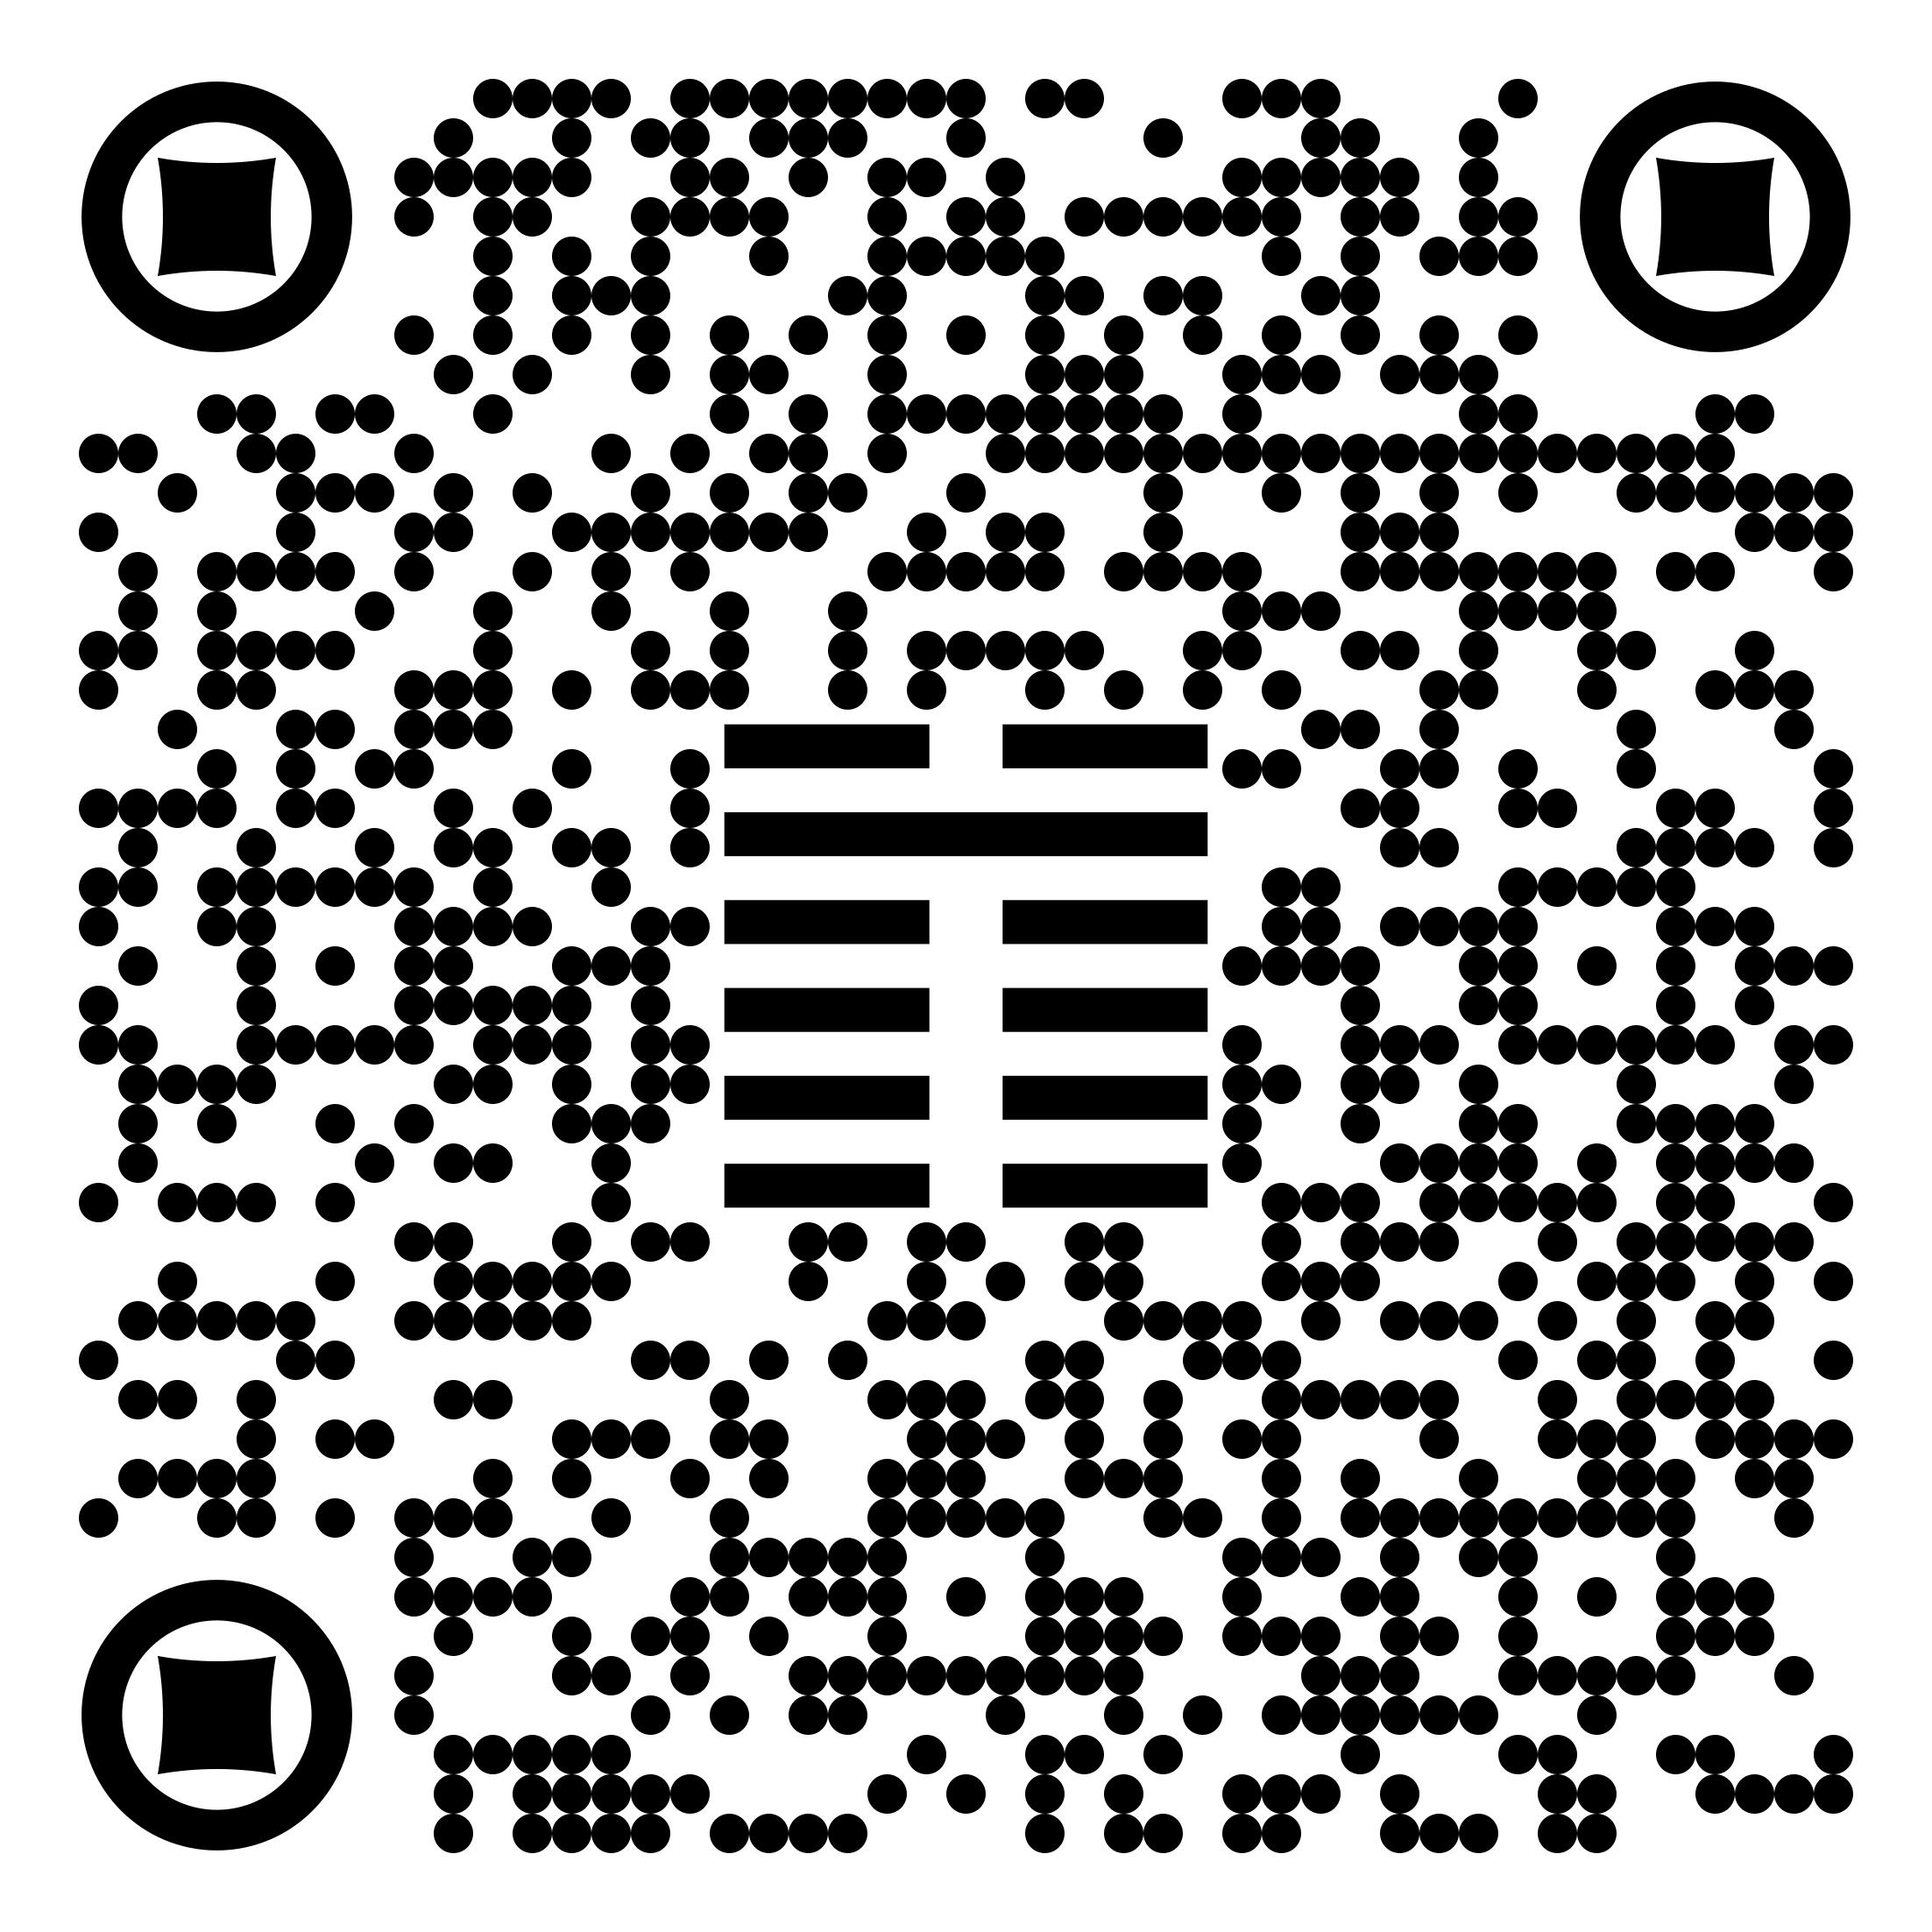 qr-code-8.png